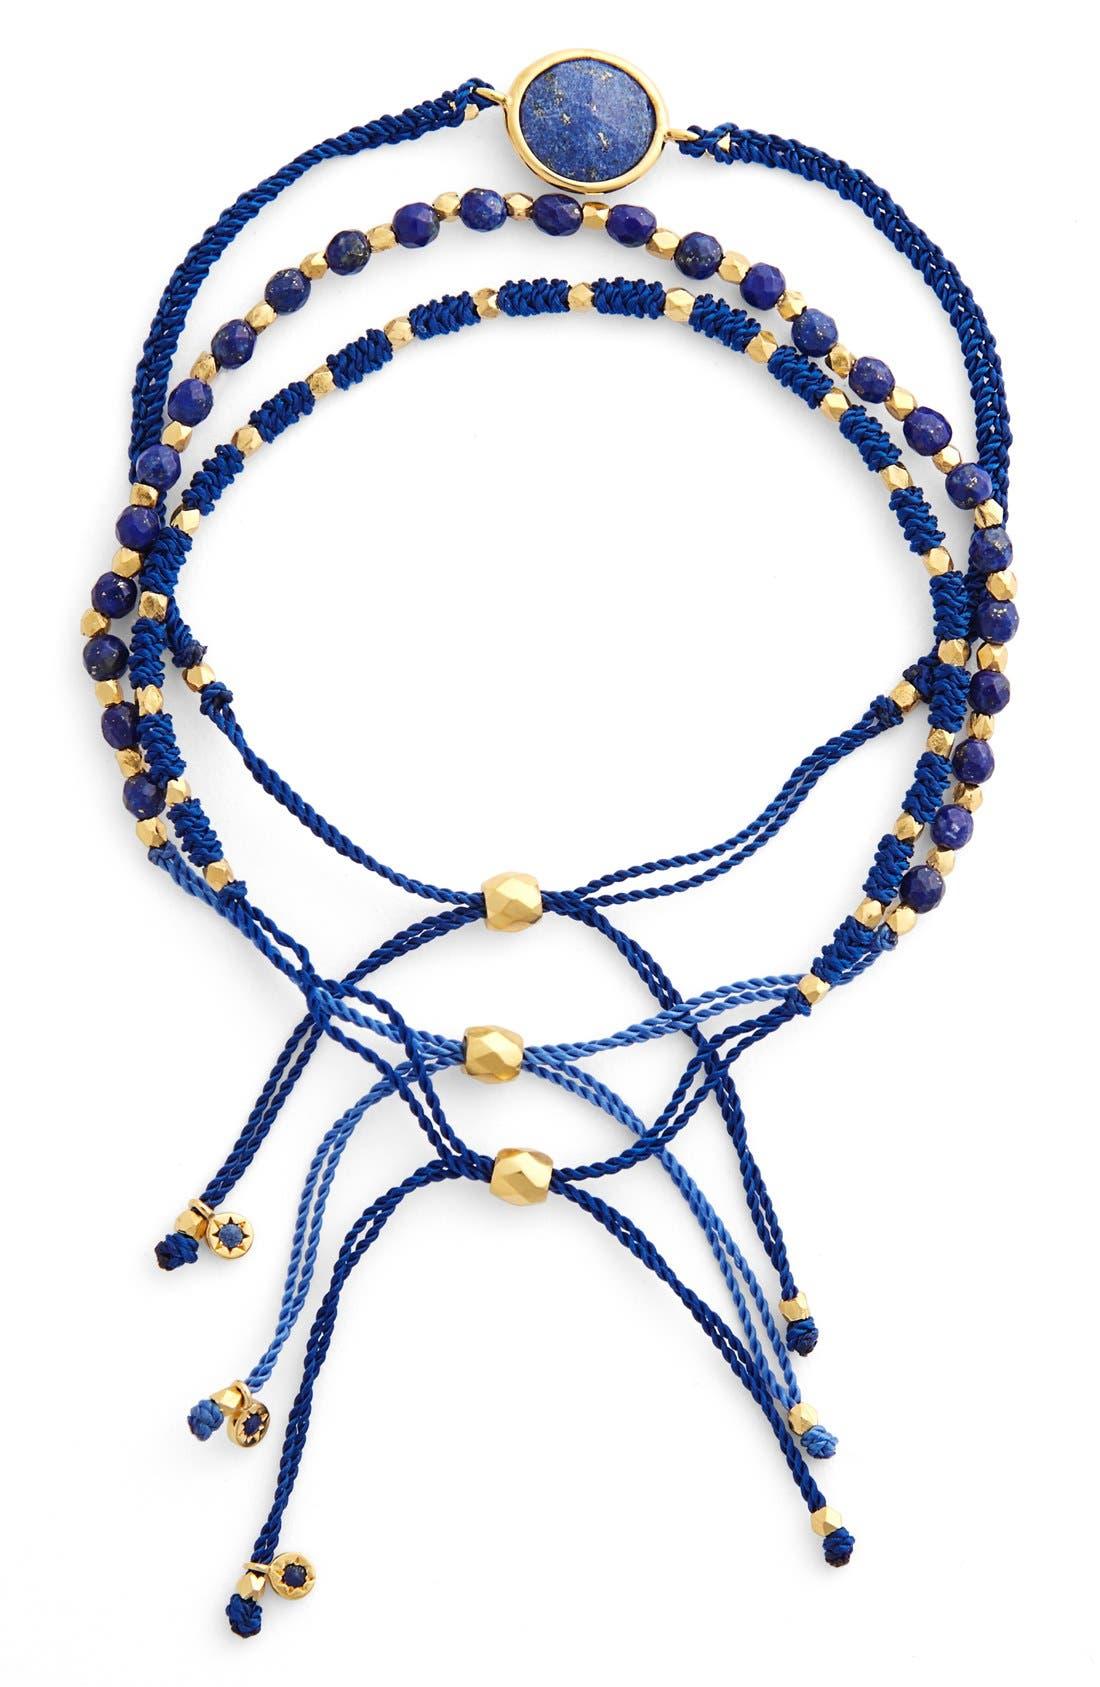 Main Image - Astley Clarke 'Biography' Mixed Media Bracelets (Set of 3)